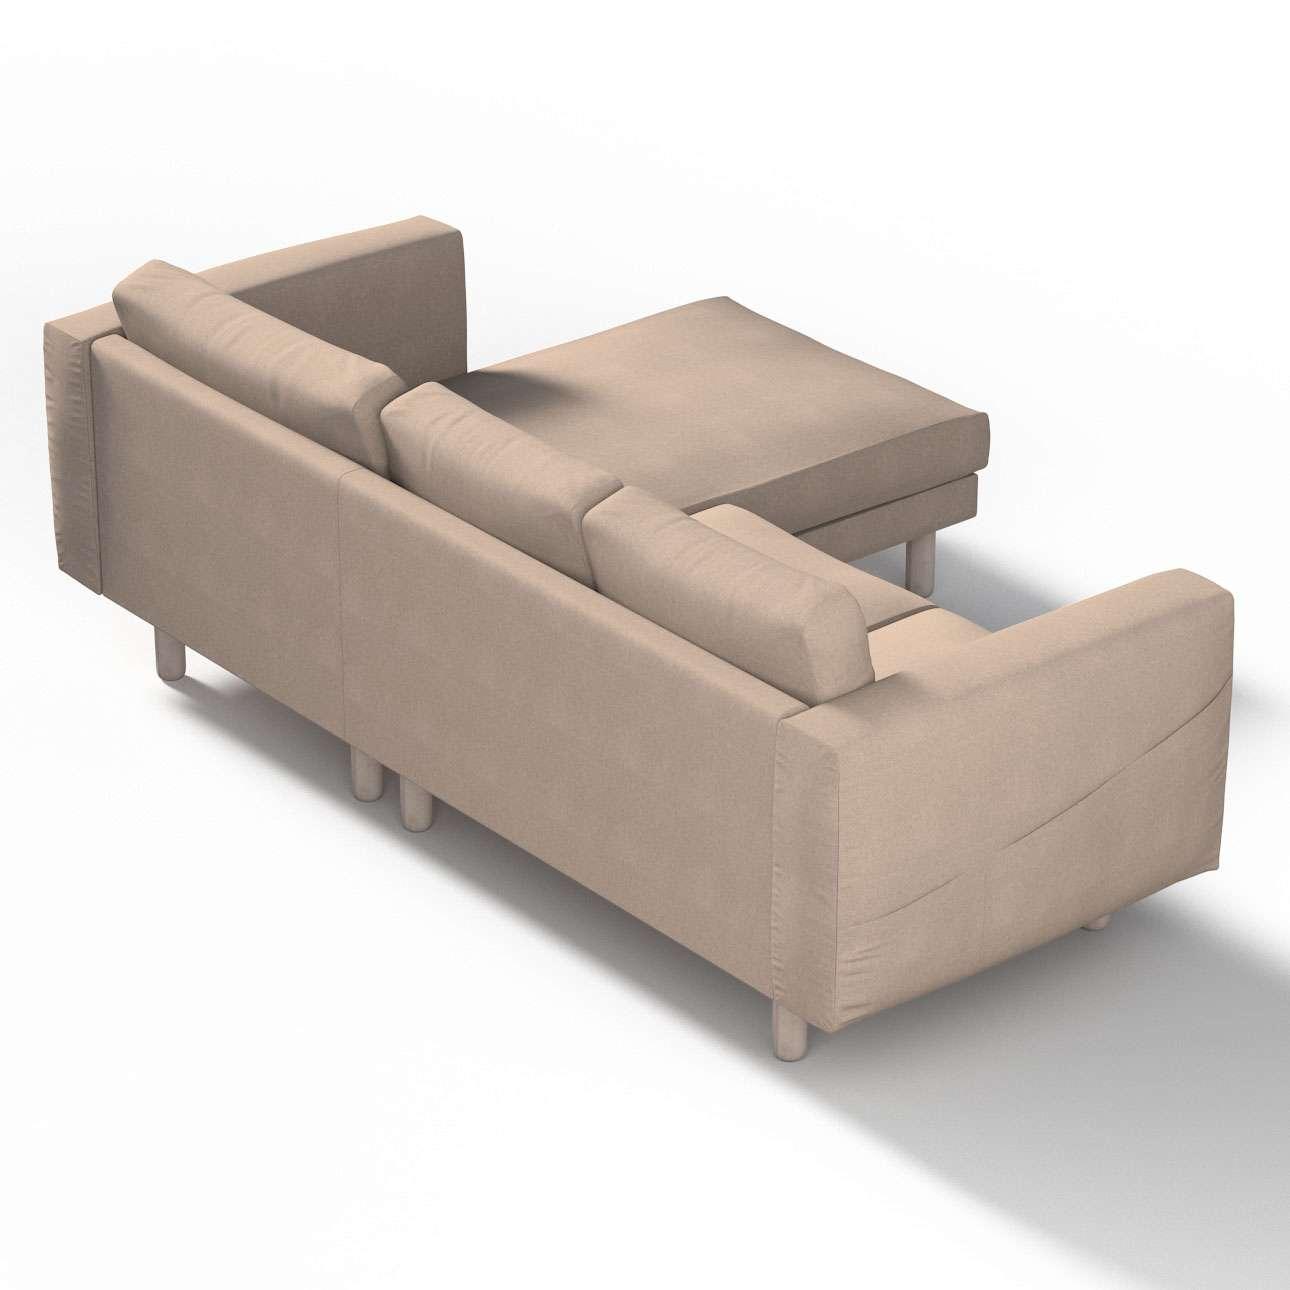 norsborg bezug f r 3 sitzer sofa mit recamiere beige grau. Black Bedroom Furniture Sets. Home Design Ideas